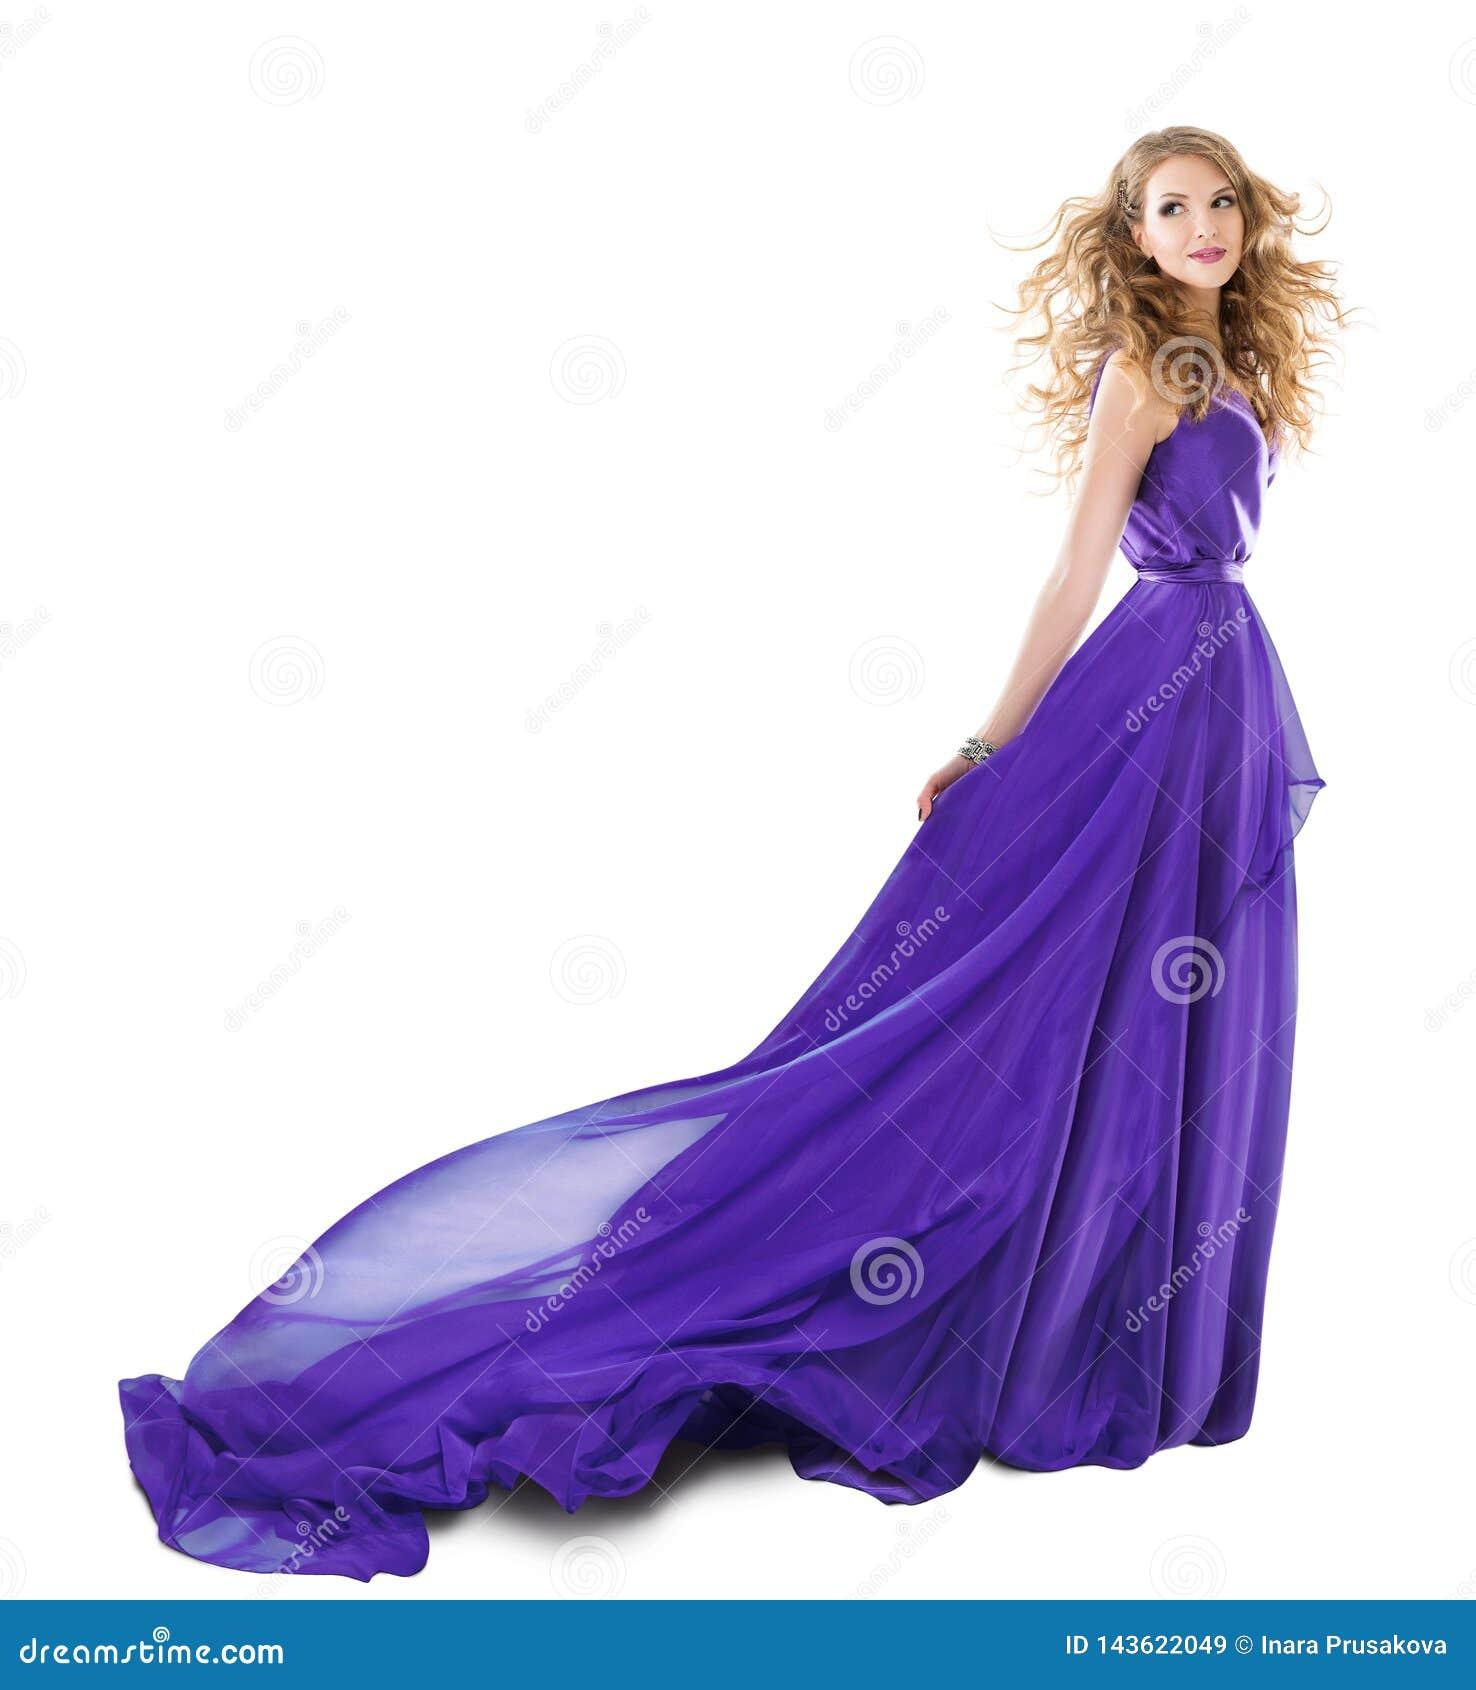 Woman Long Purple Dress, Fashion Model in Evening Gown, Girl full length Beauty portrait on White